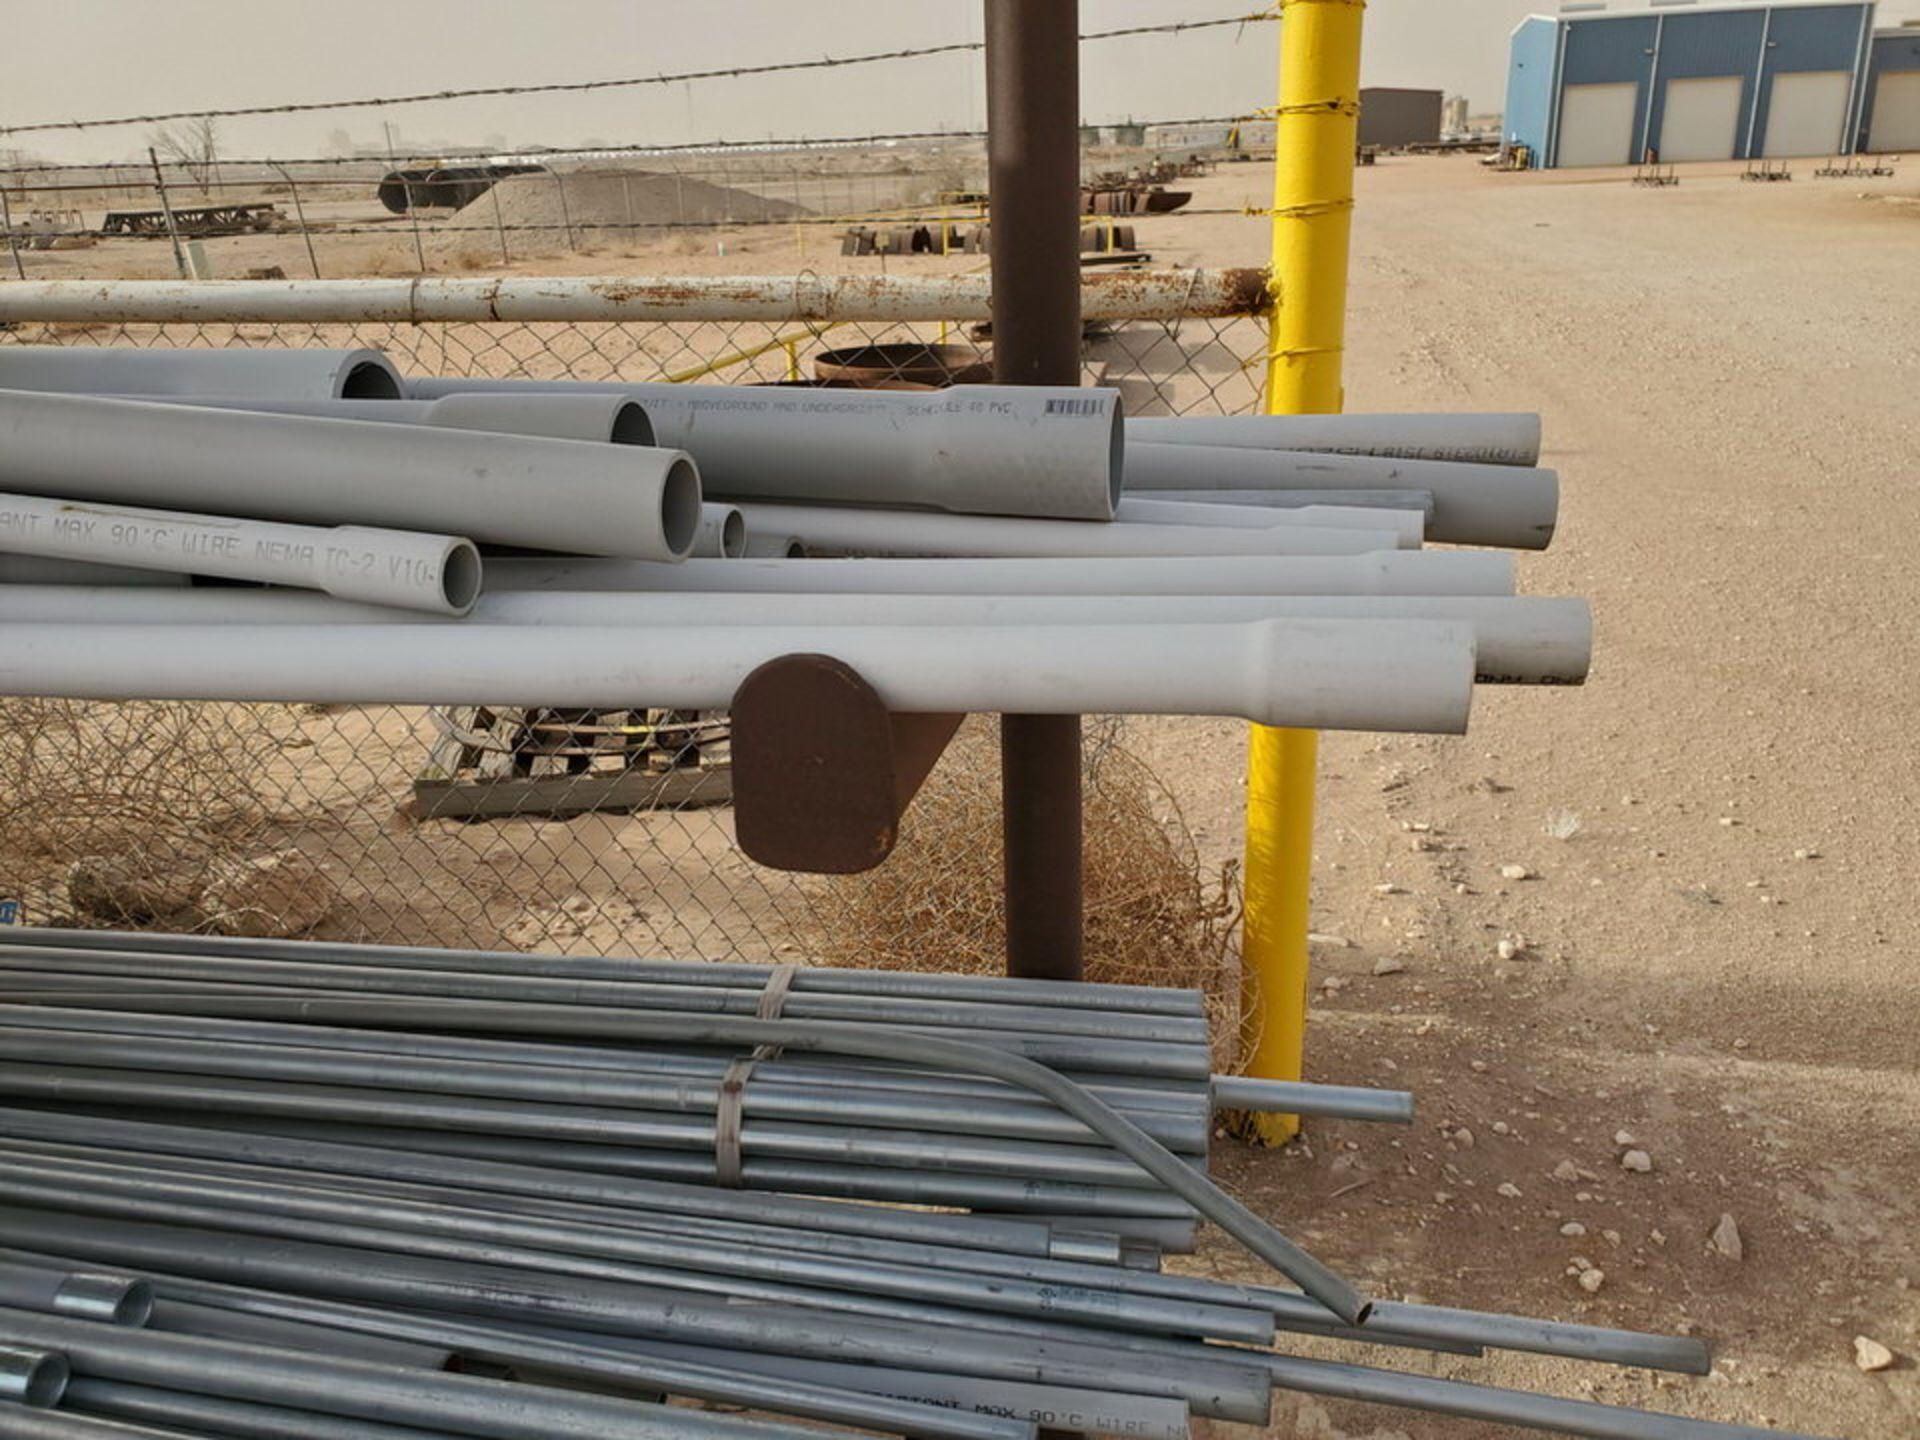 "PVC & Alum. Pipe W/ Conduit Size Range: 1/2"" - 4"" W/ Rack - Image 6 of 18"